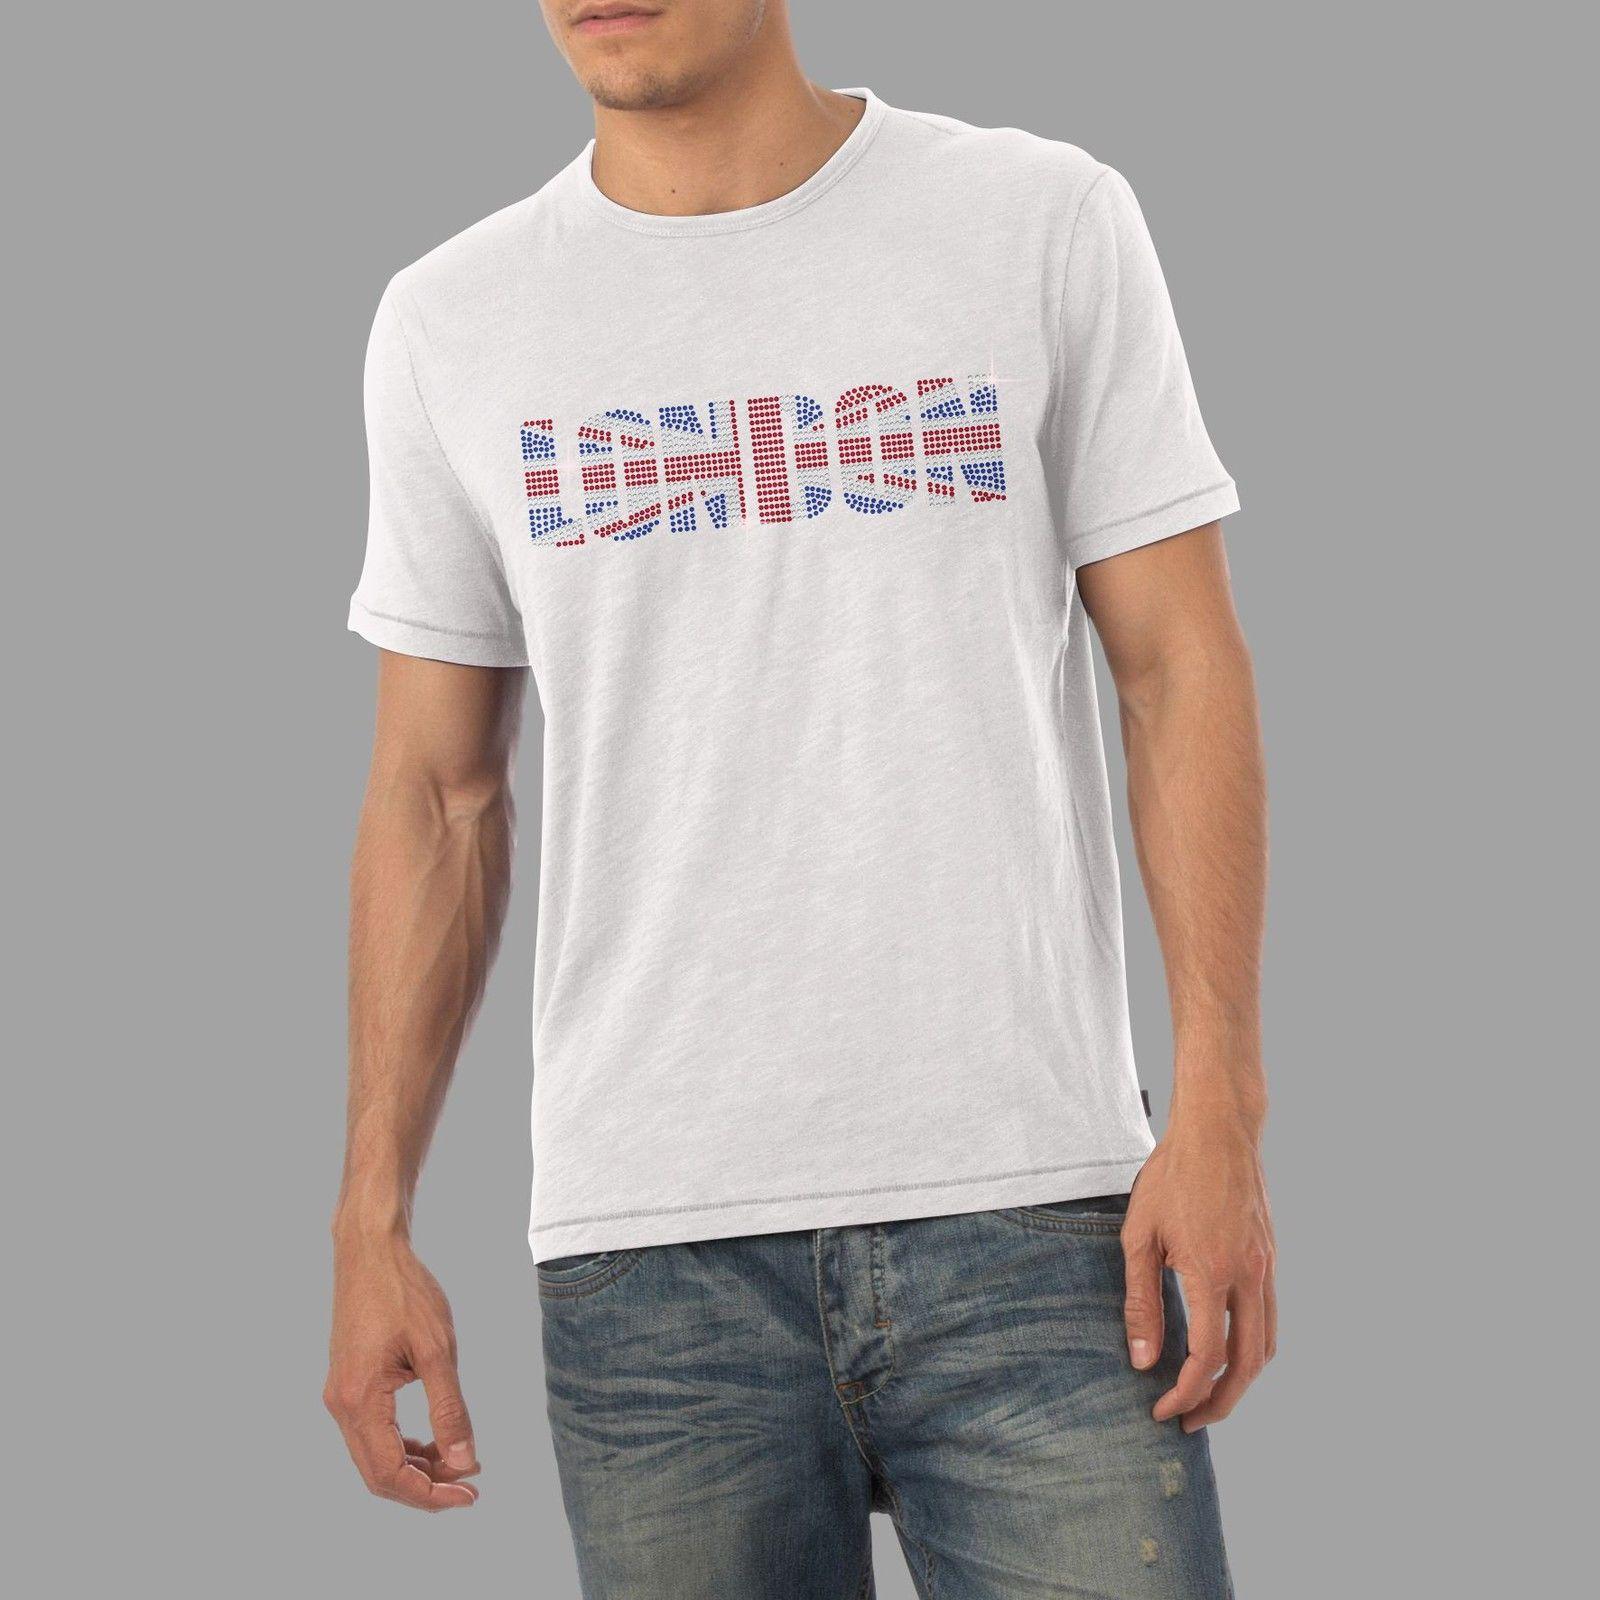 Shirt design london - London T Shirt Design